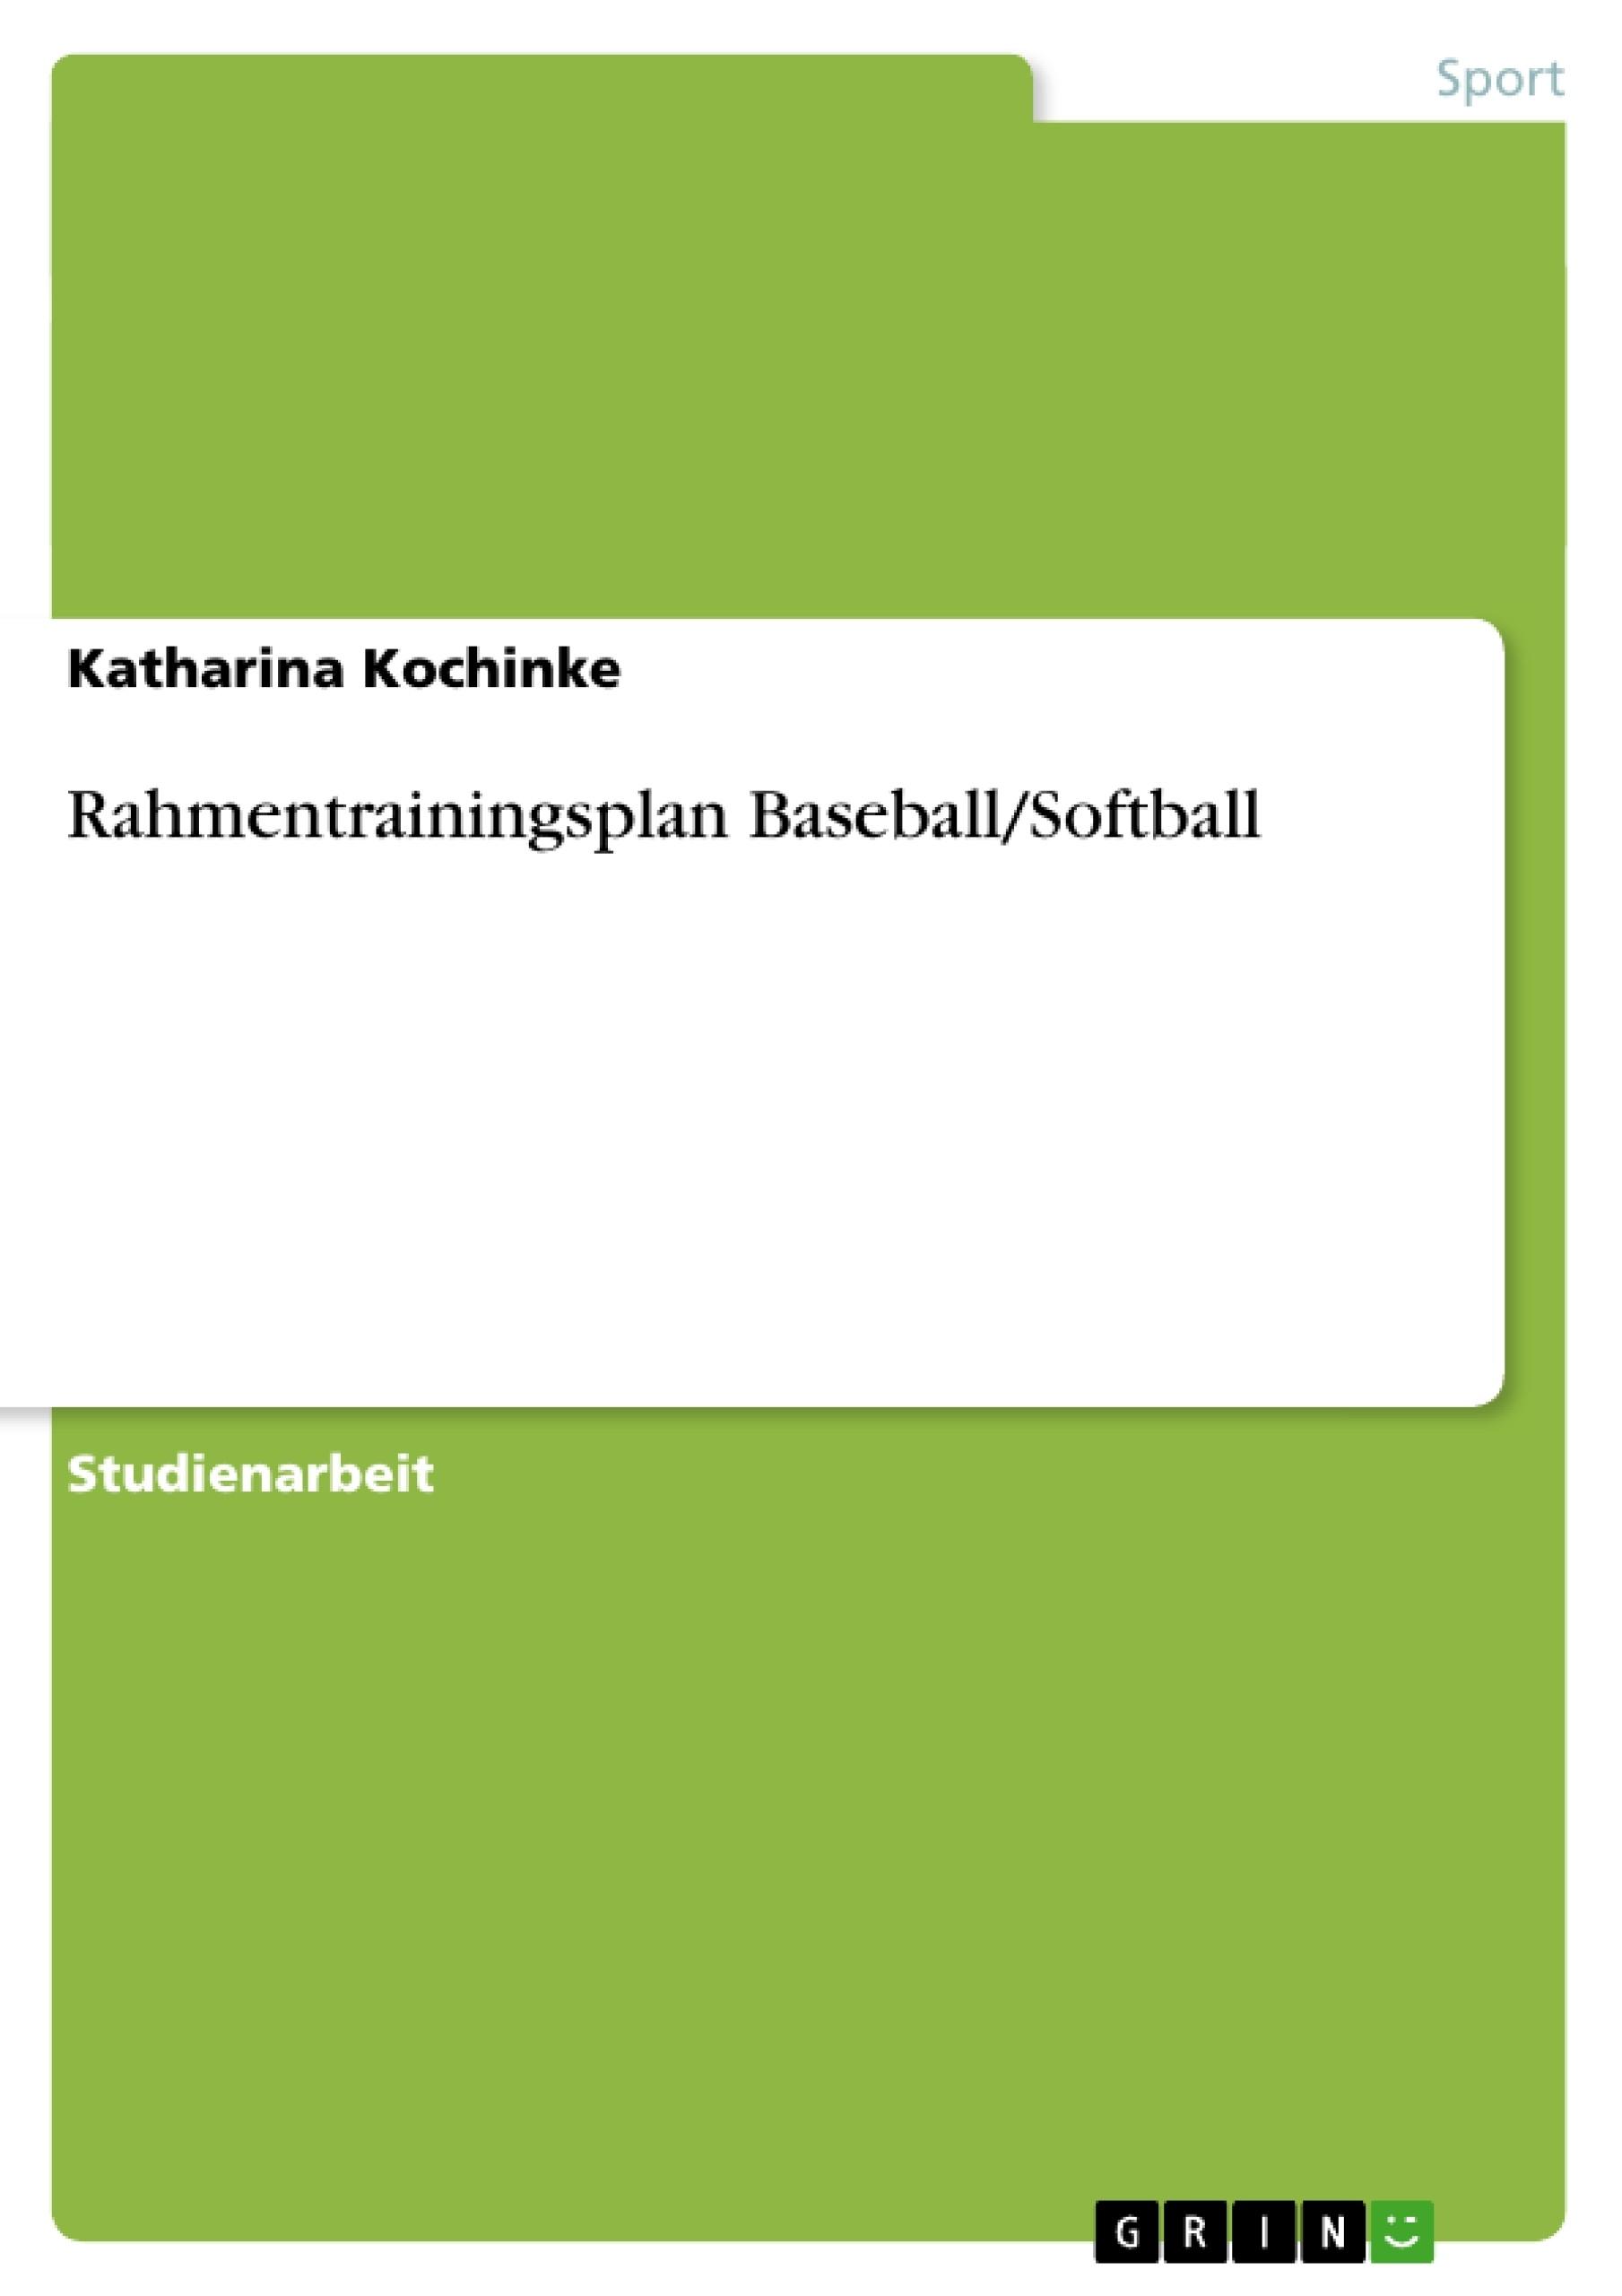 Titel: Rahmentrainingsplan Baseball/Softball